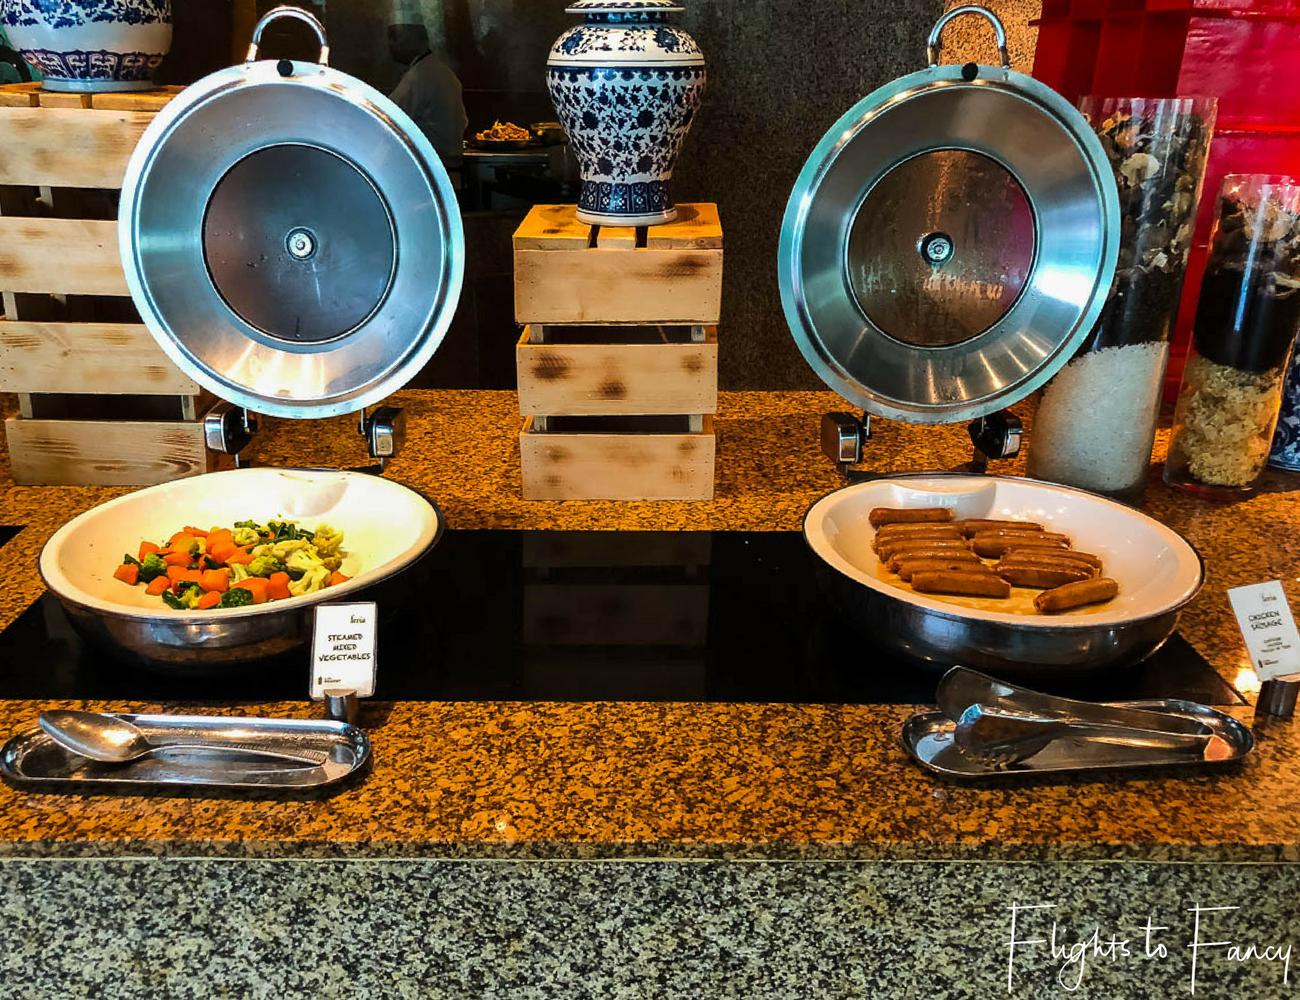 Hotel near SM Cebu City - Radisson Blue Cebu Buffet Breakfast Chicken Sausages and Vegetables by Flights to Fancy